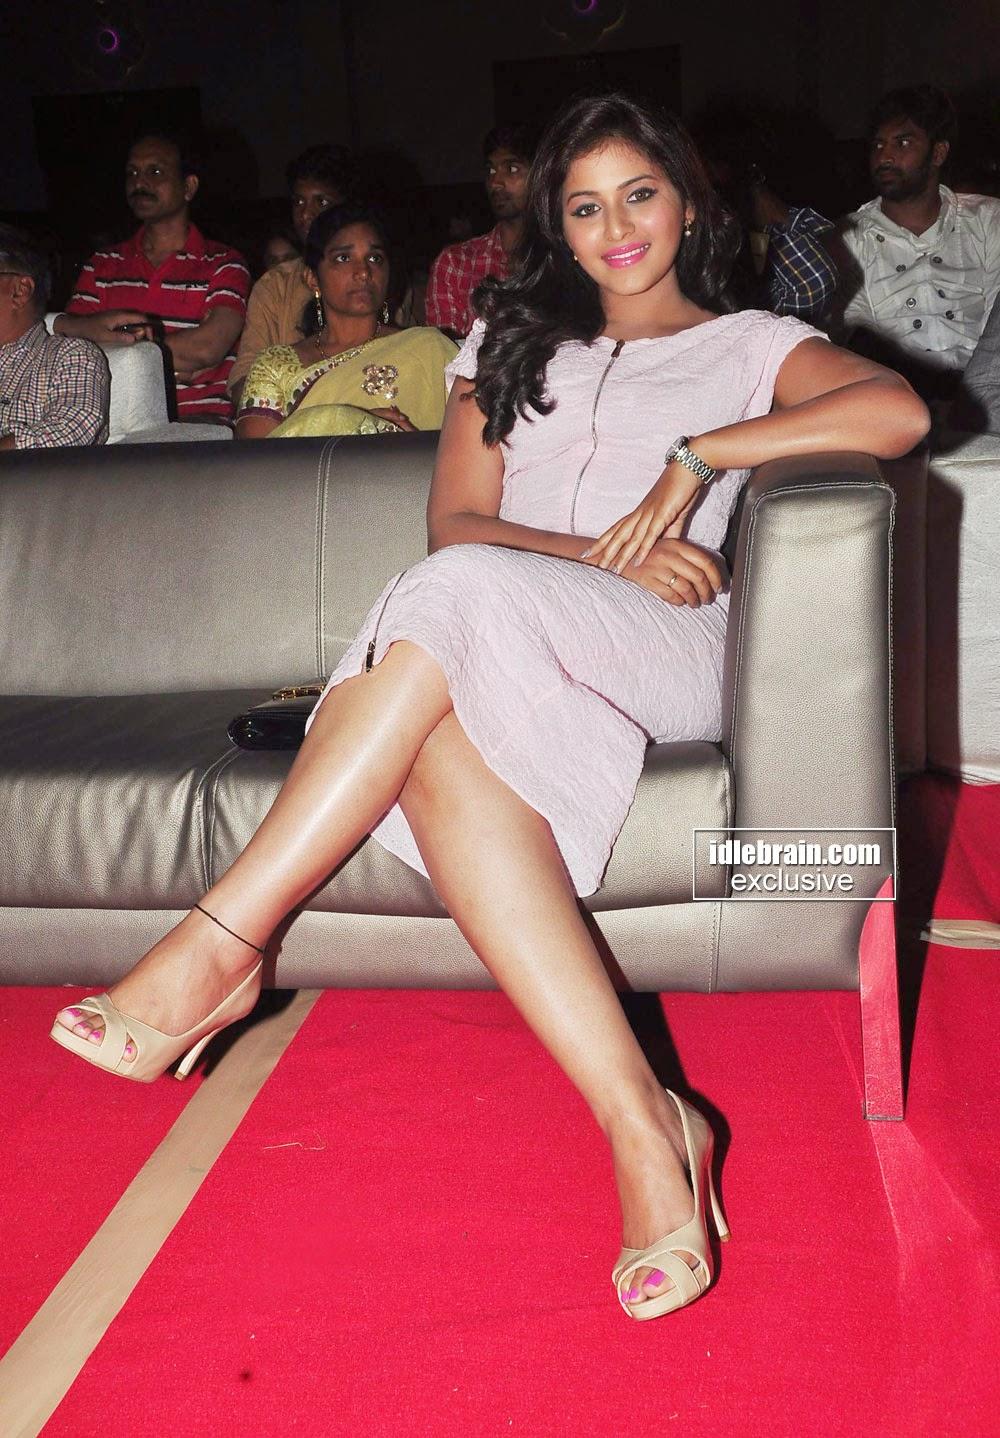 actress crossed legs